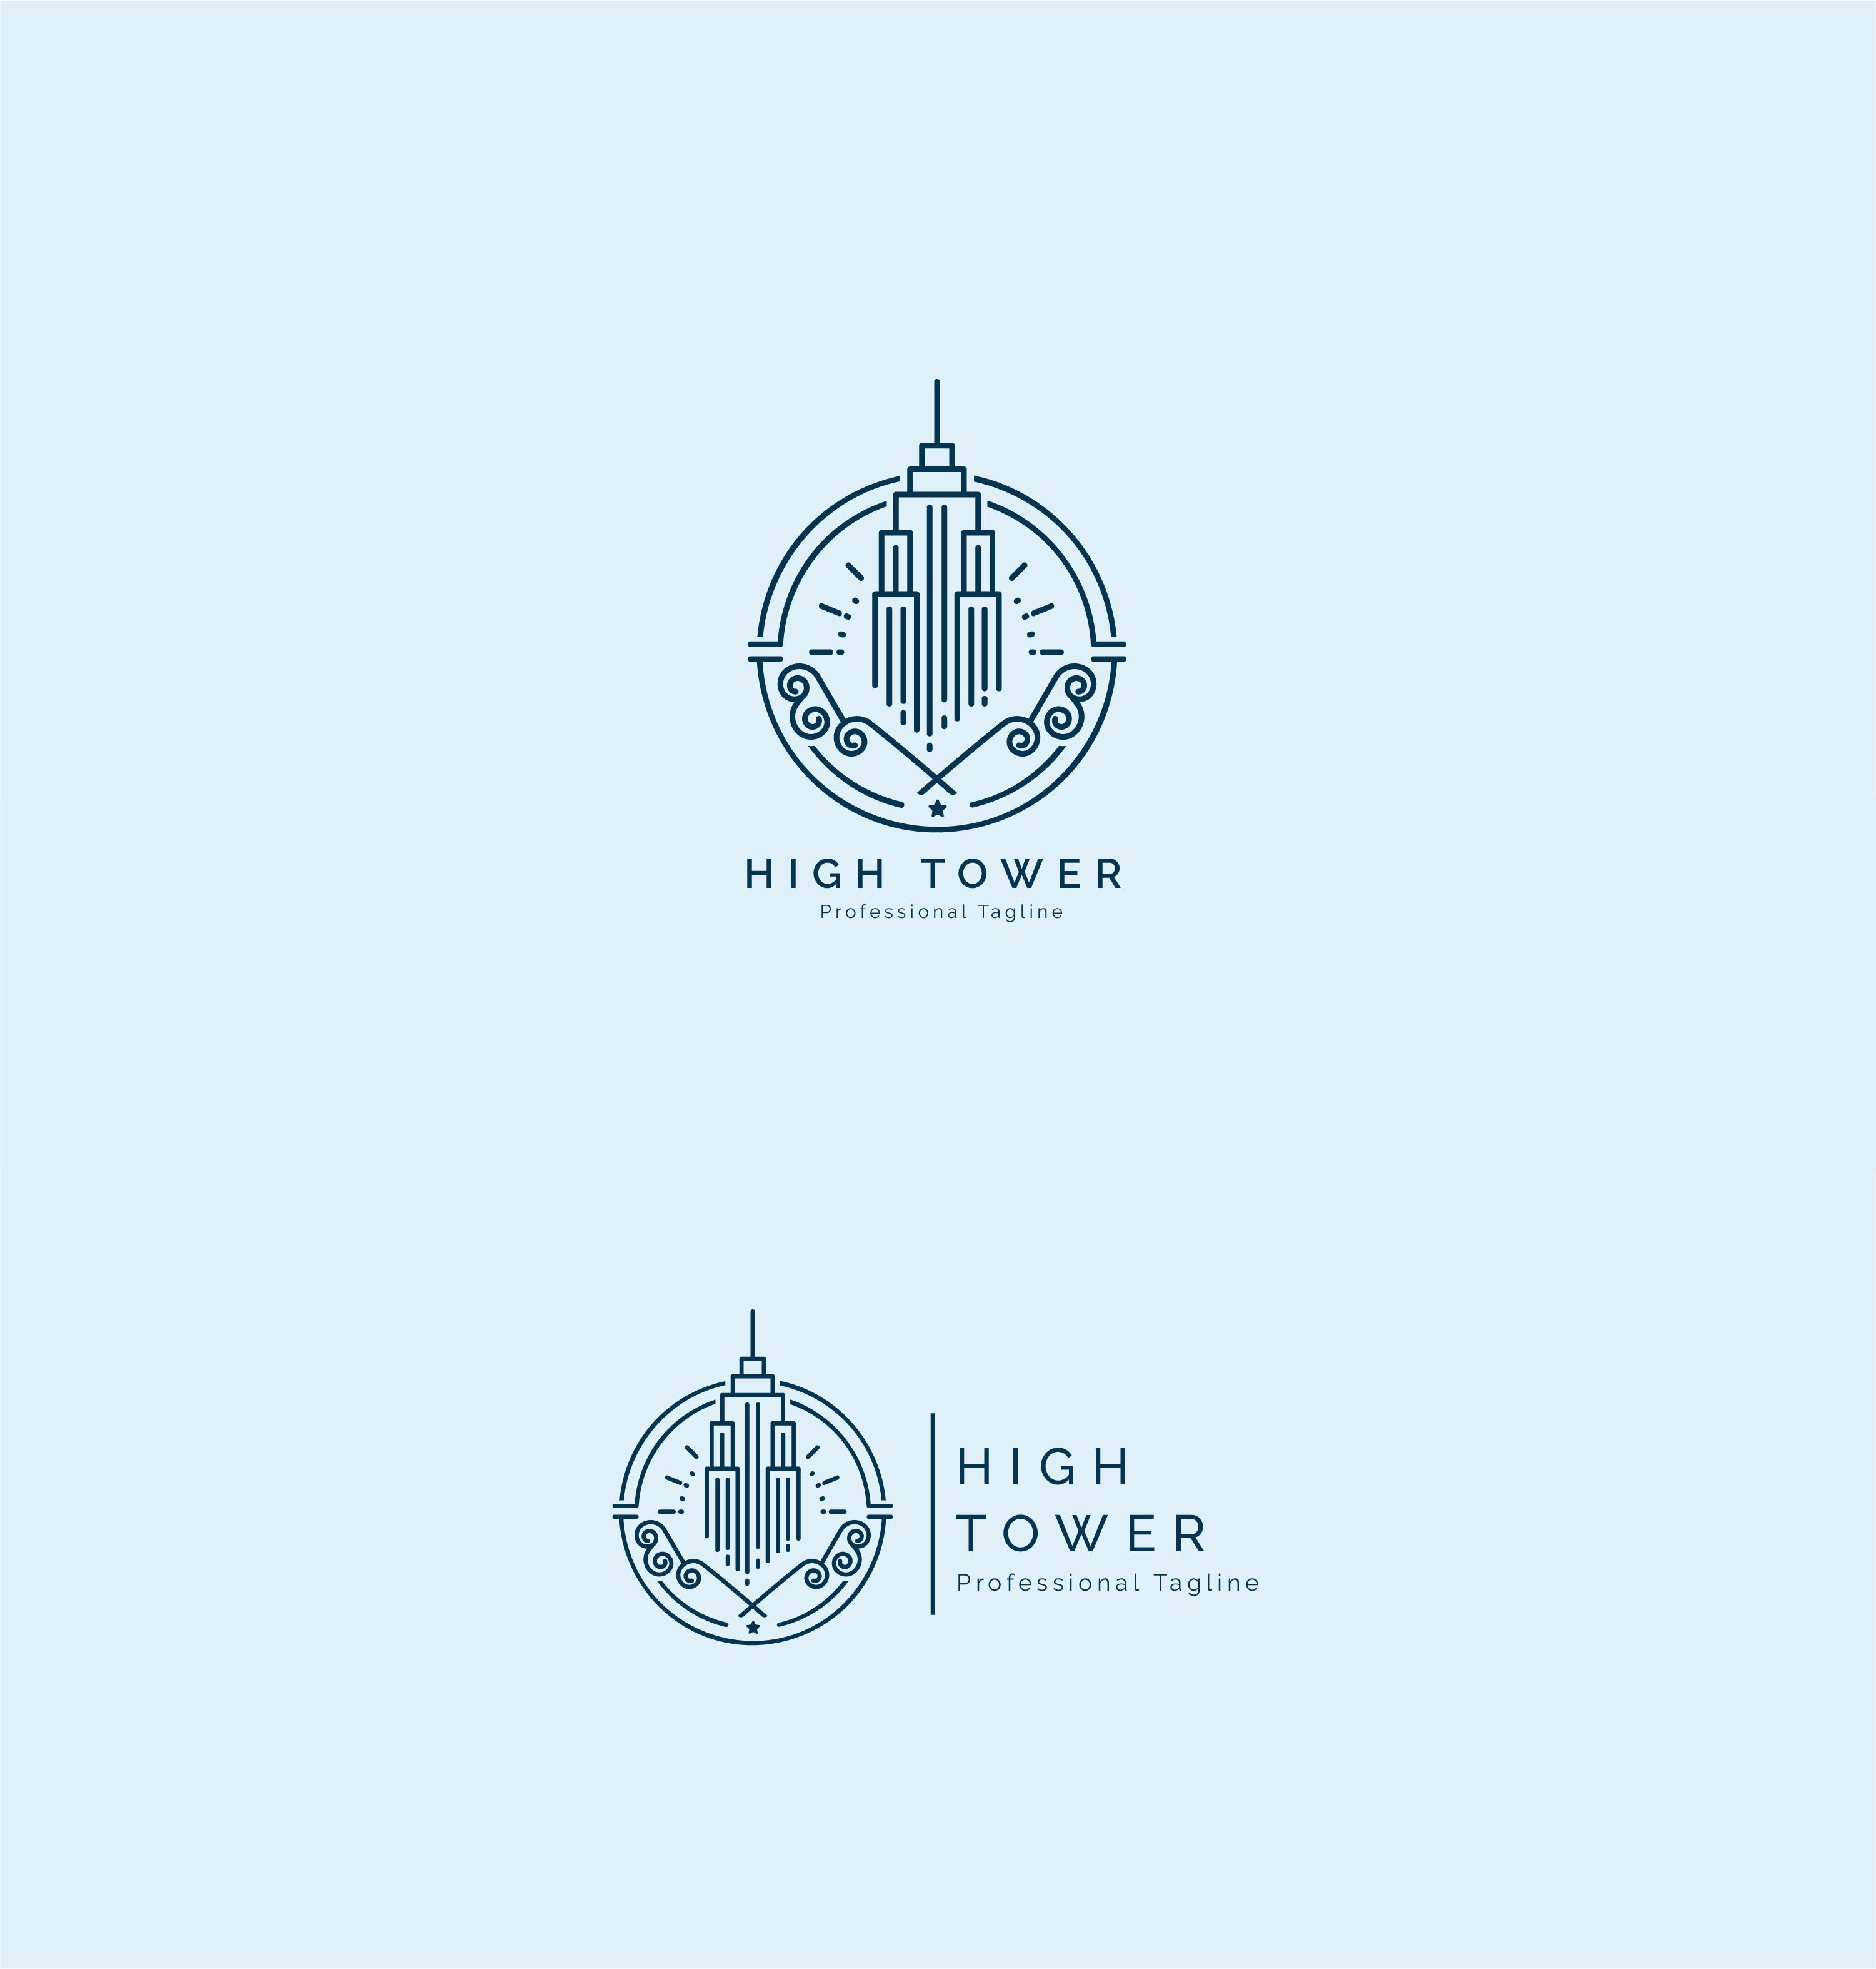 High Tower Logo - Construction Building Logo example image 4